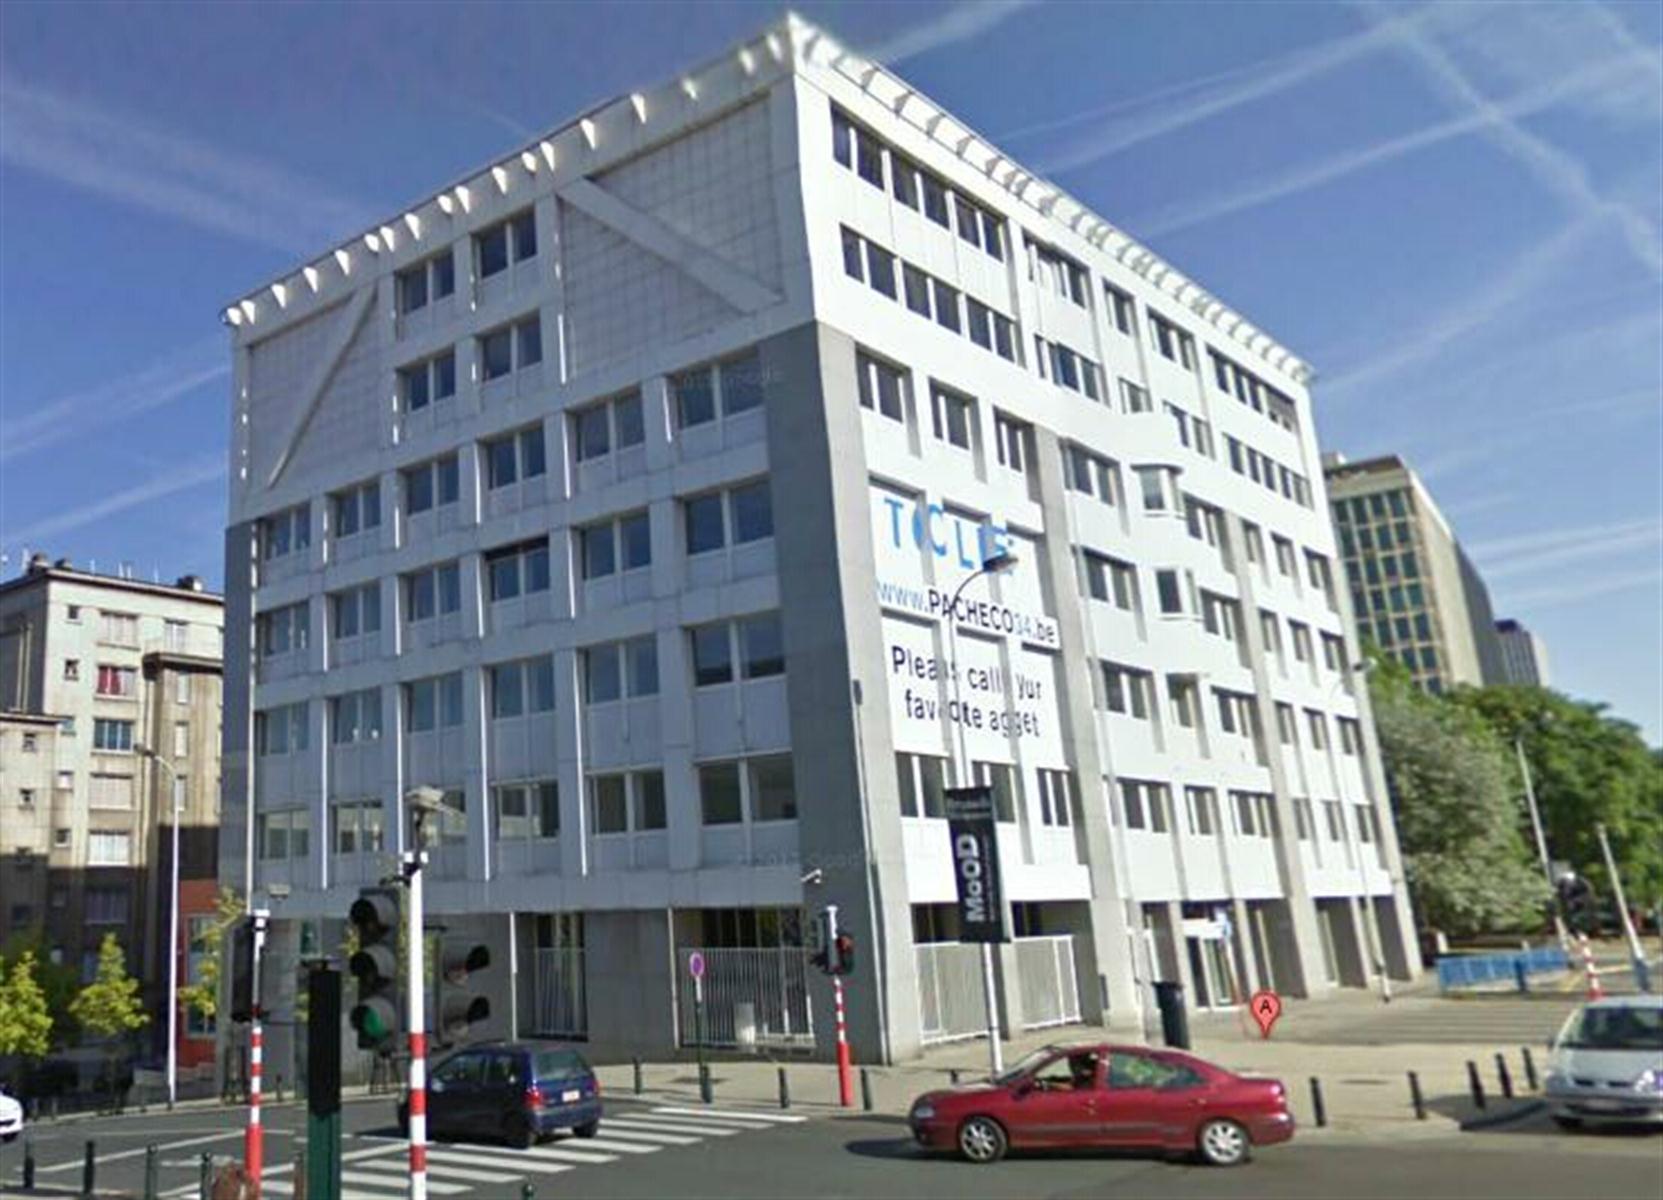 PACHECO 34 - Bruxelles - #2974881-1